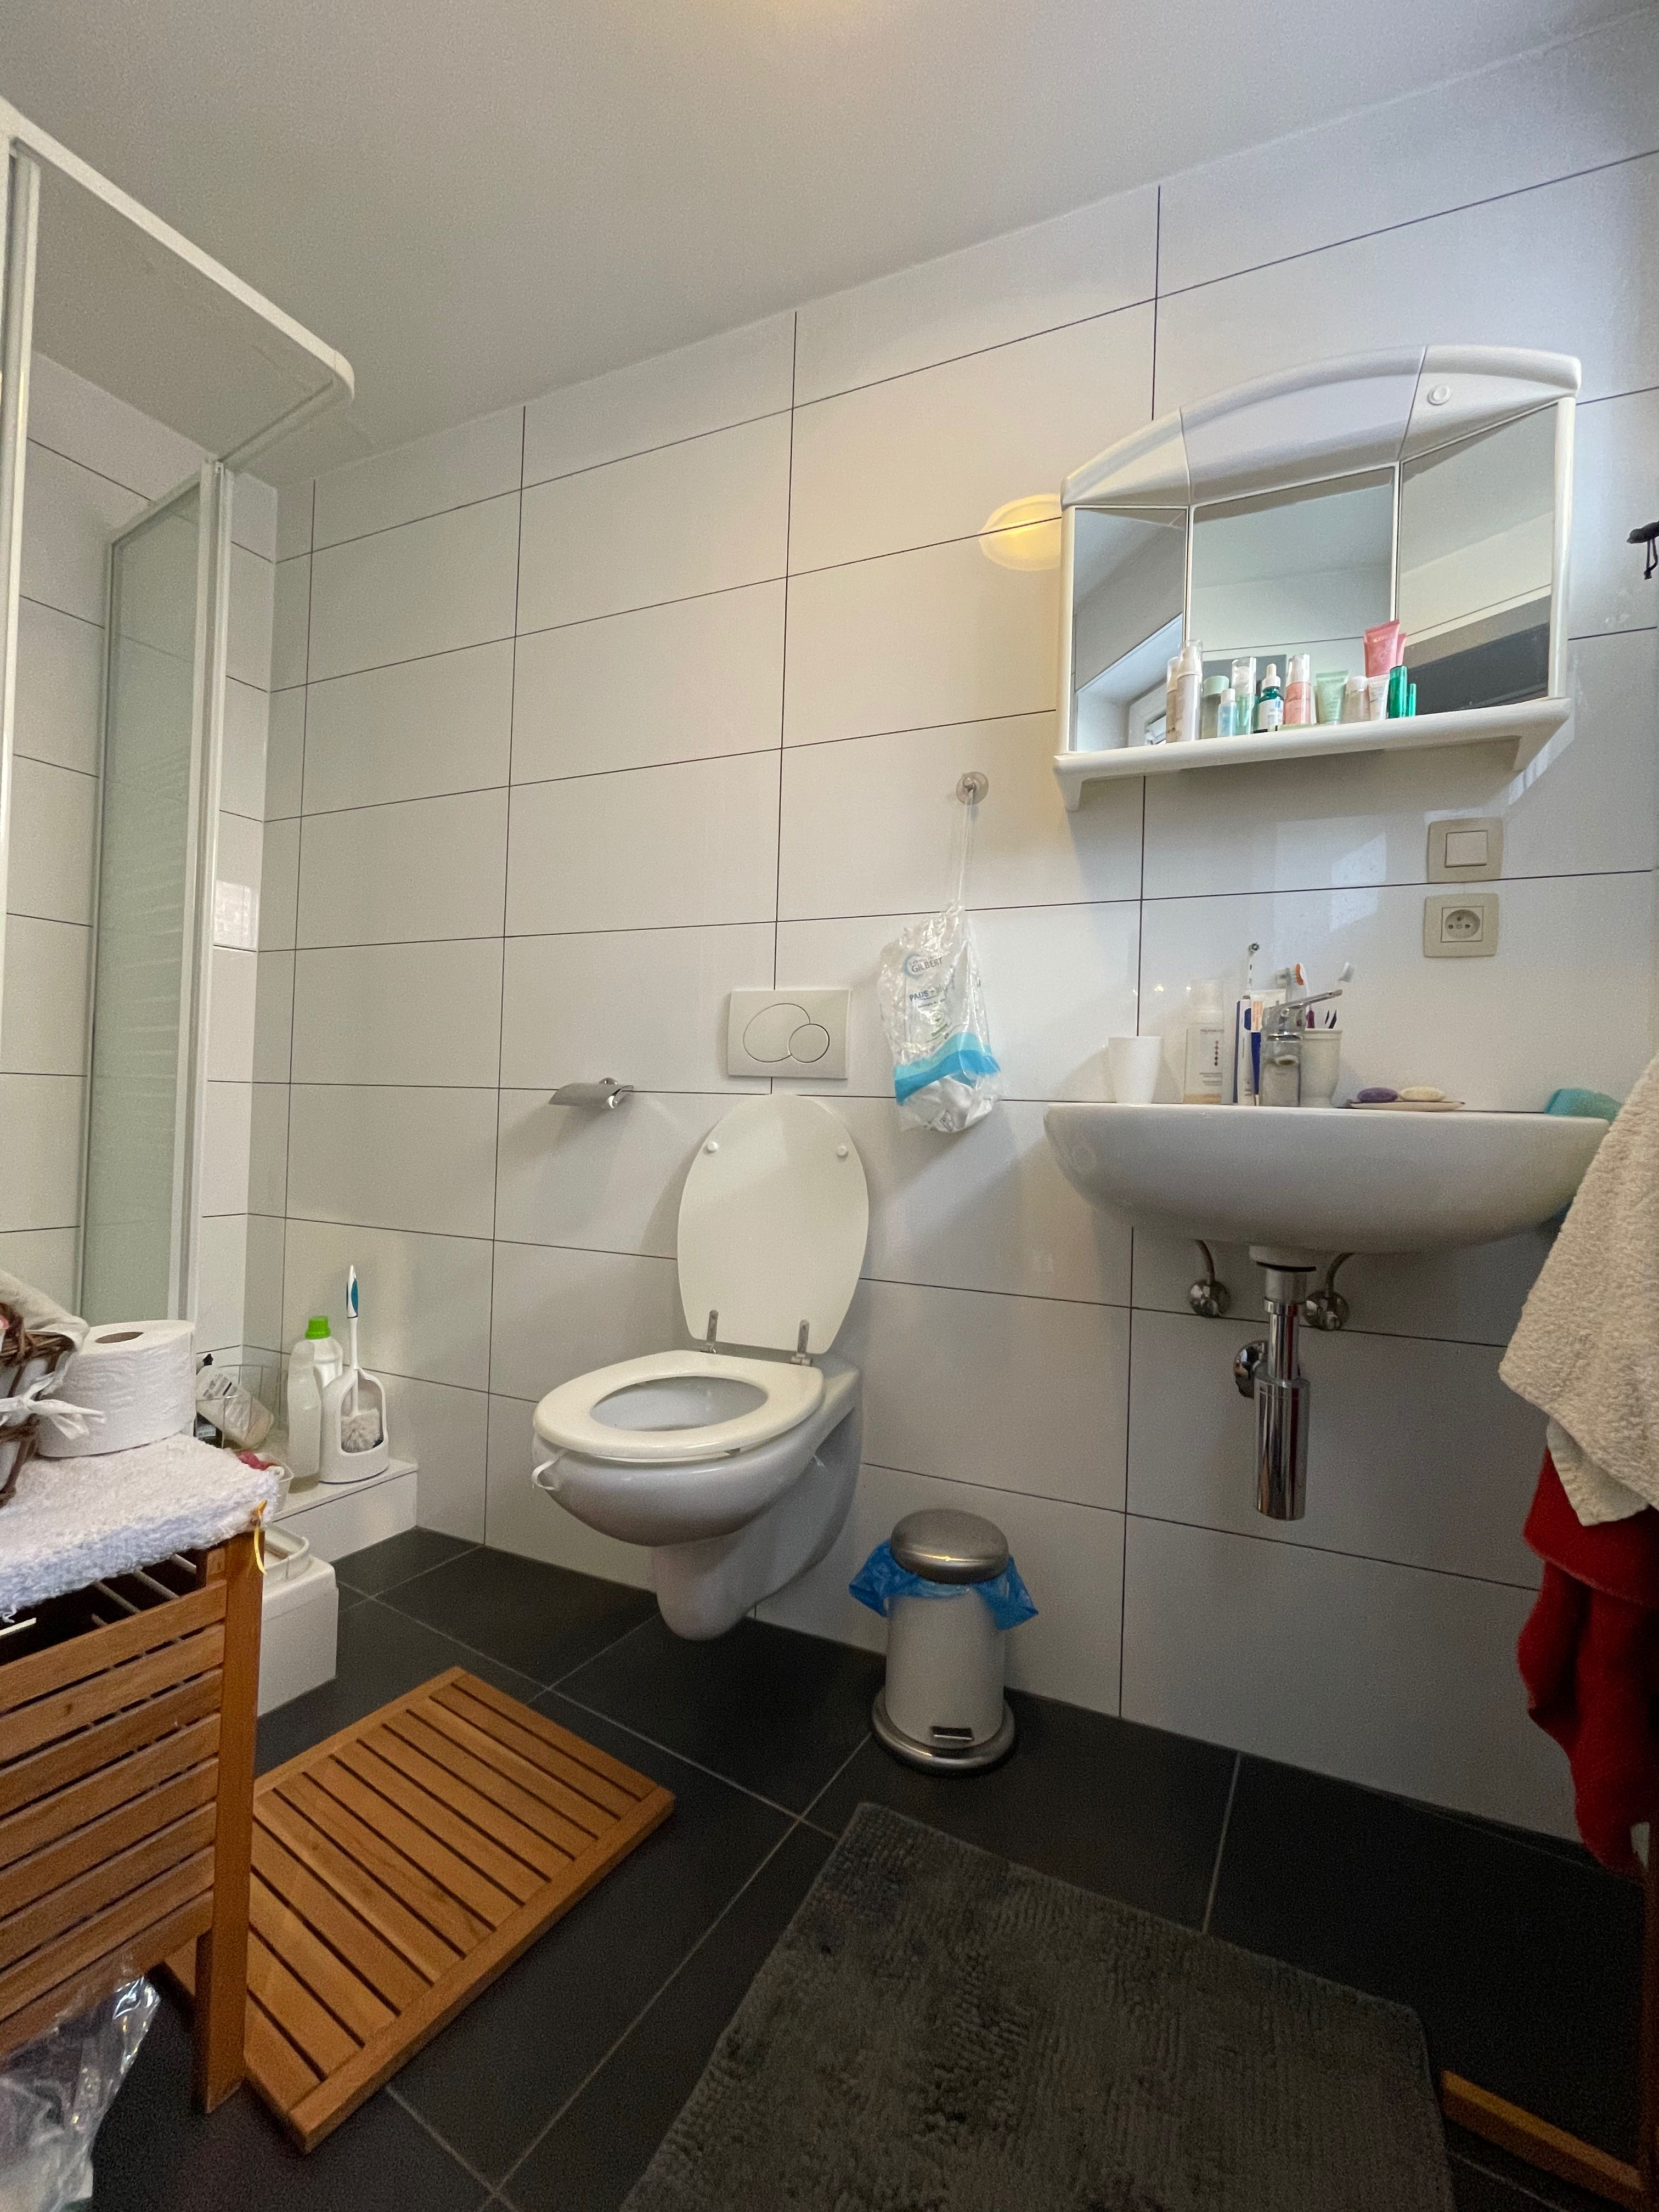 DB3-0201 - badkamer, douche, toilet, was